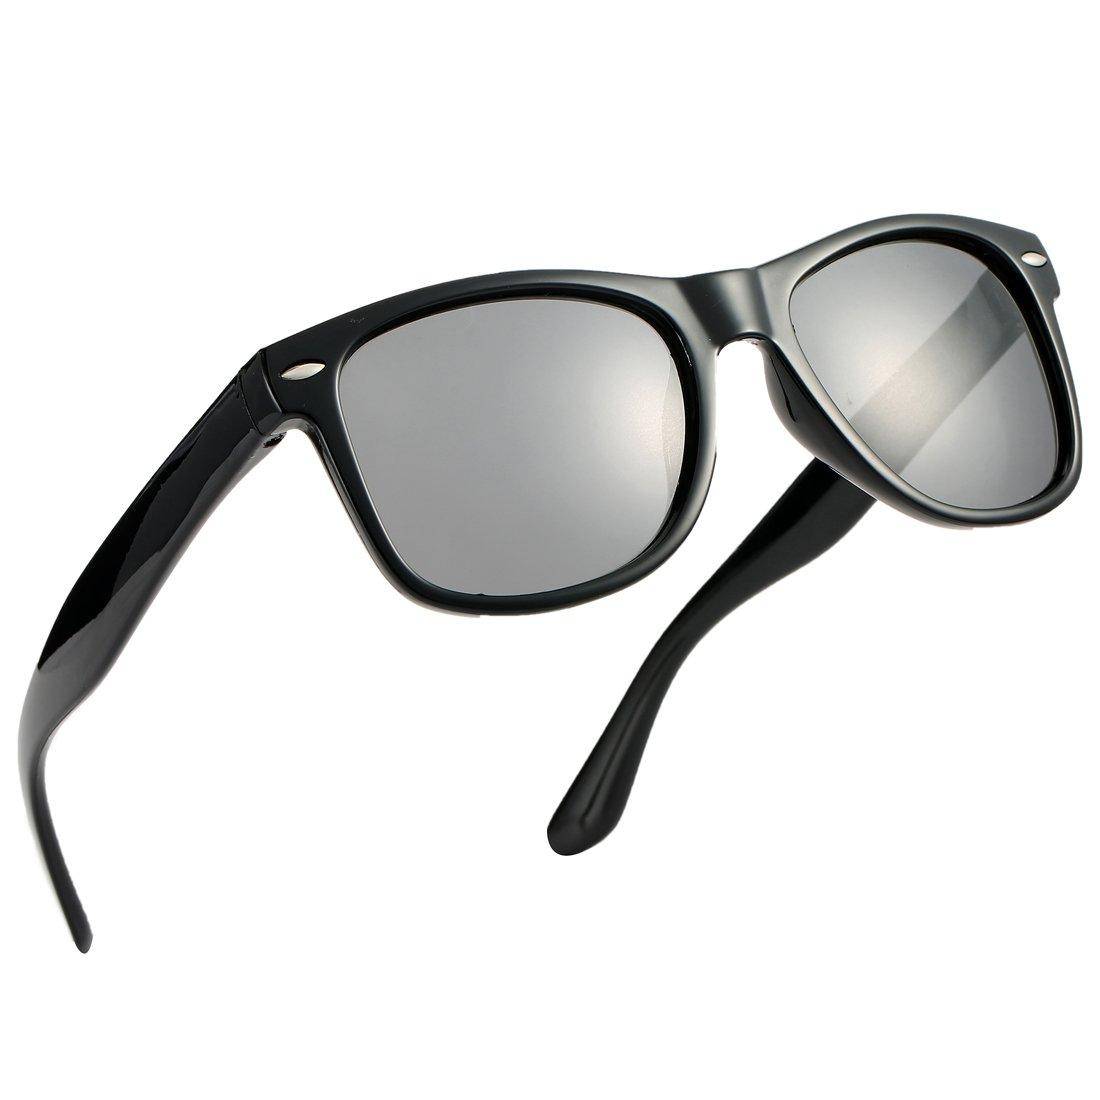 Pro Acme TPEE Rubber Flexible Polarized Sunglasses (Black Frame/Black Lens/54) by Pro Acme